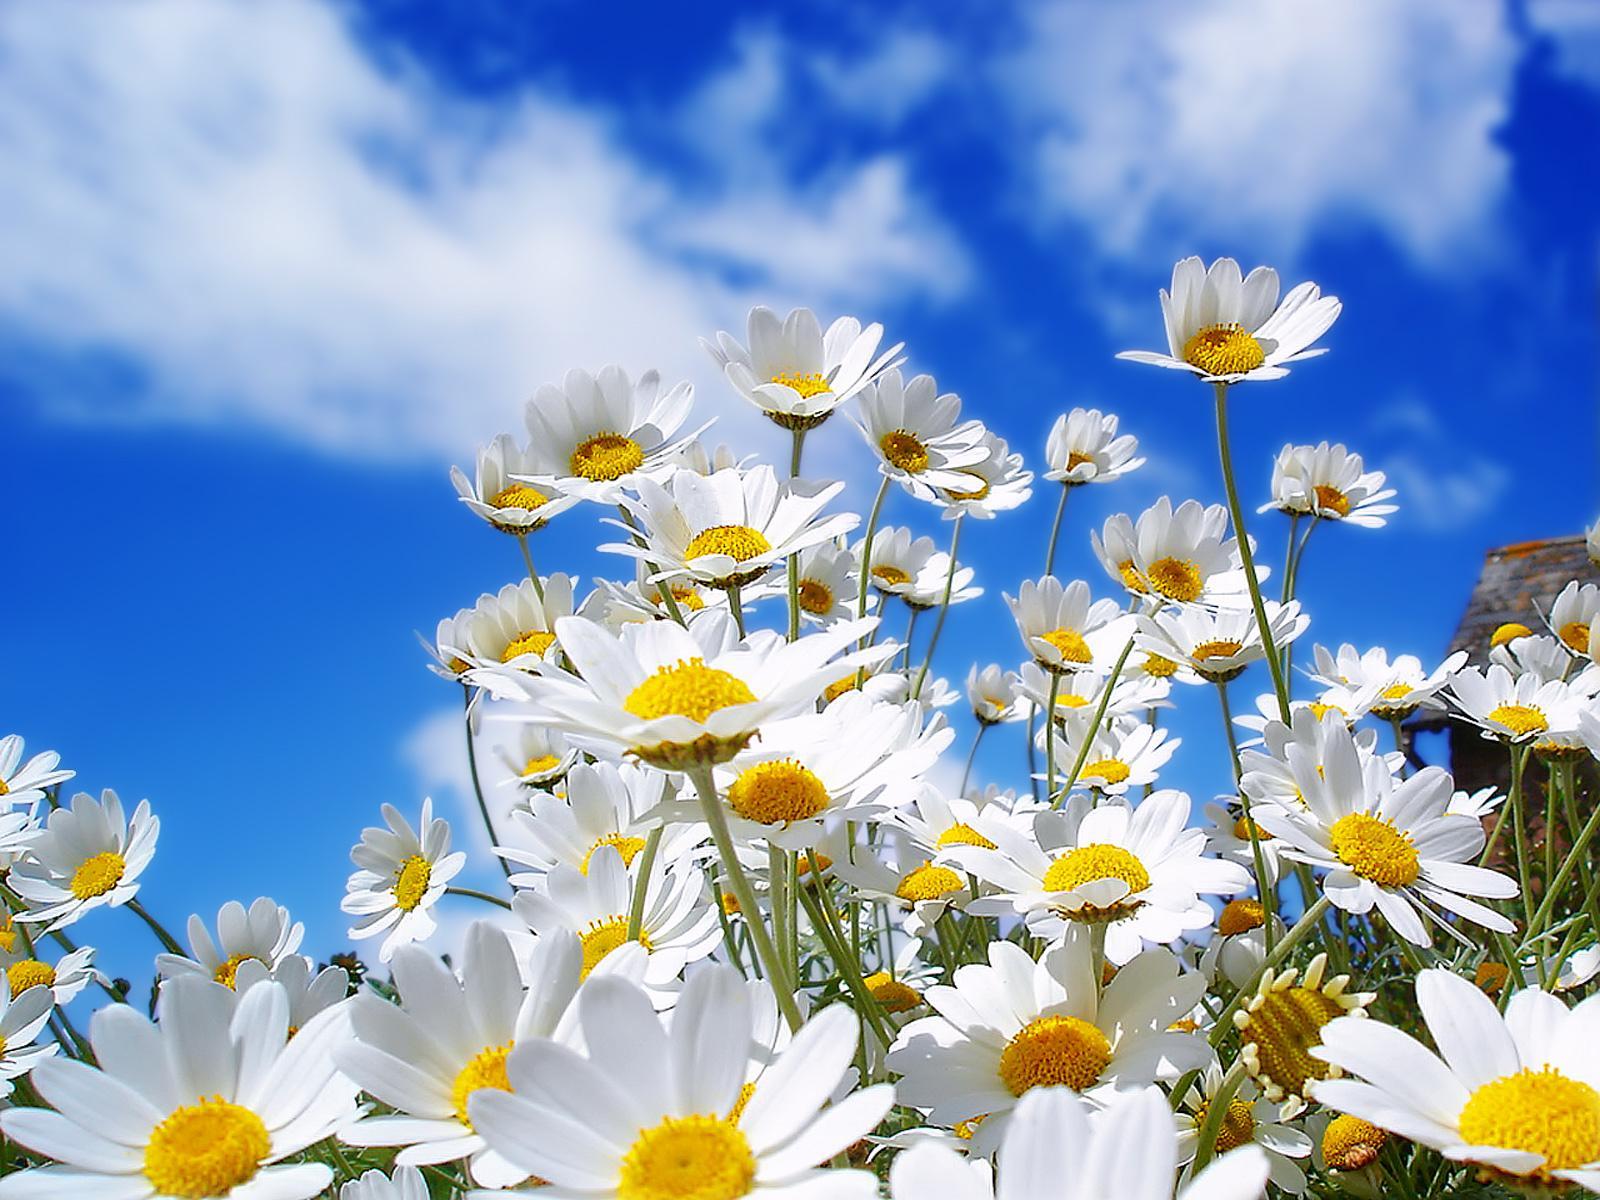 http://2.bp.blogspot.com/_a13znMHi5s4/TFgdfX6e9DI/AAAAAAAAAAU/FAwioixYBnI/s1600/spring.jpg